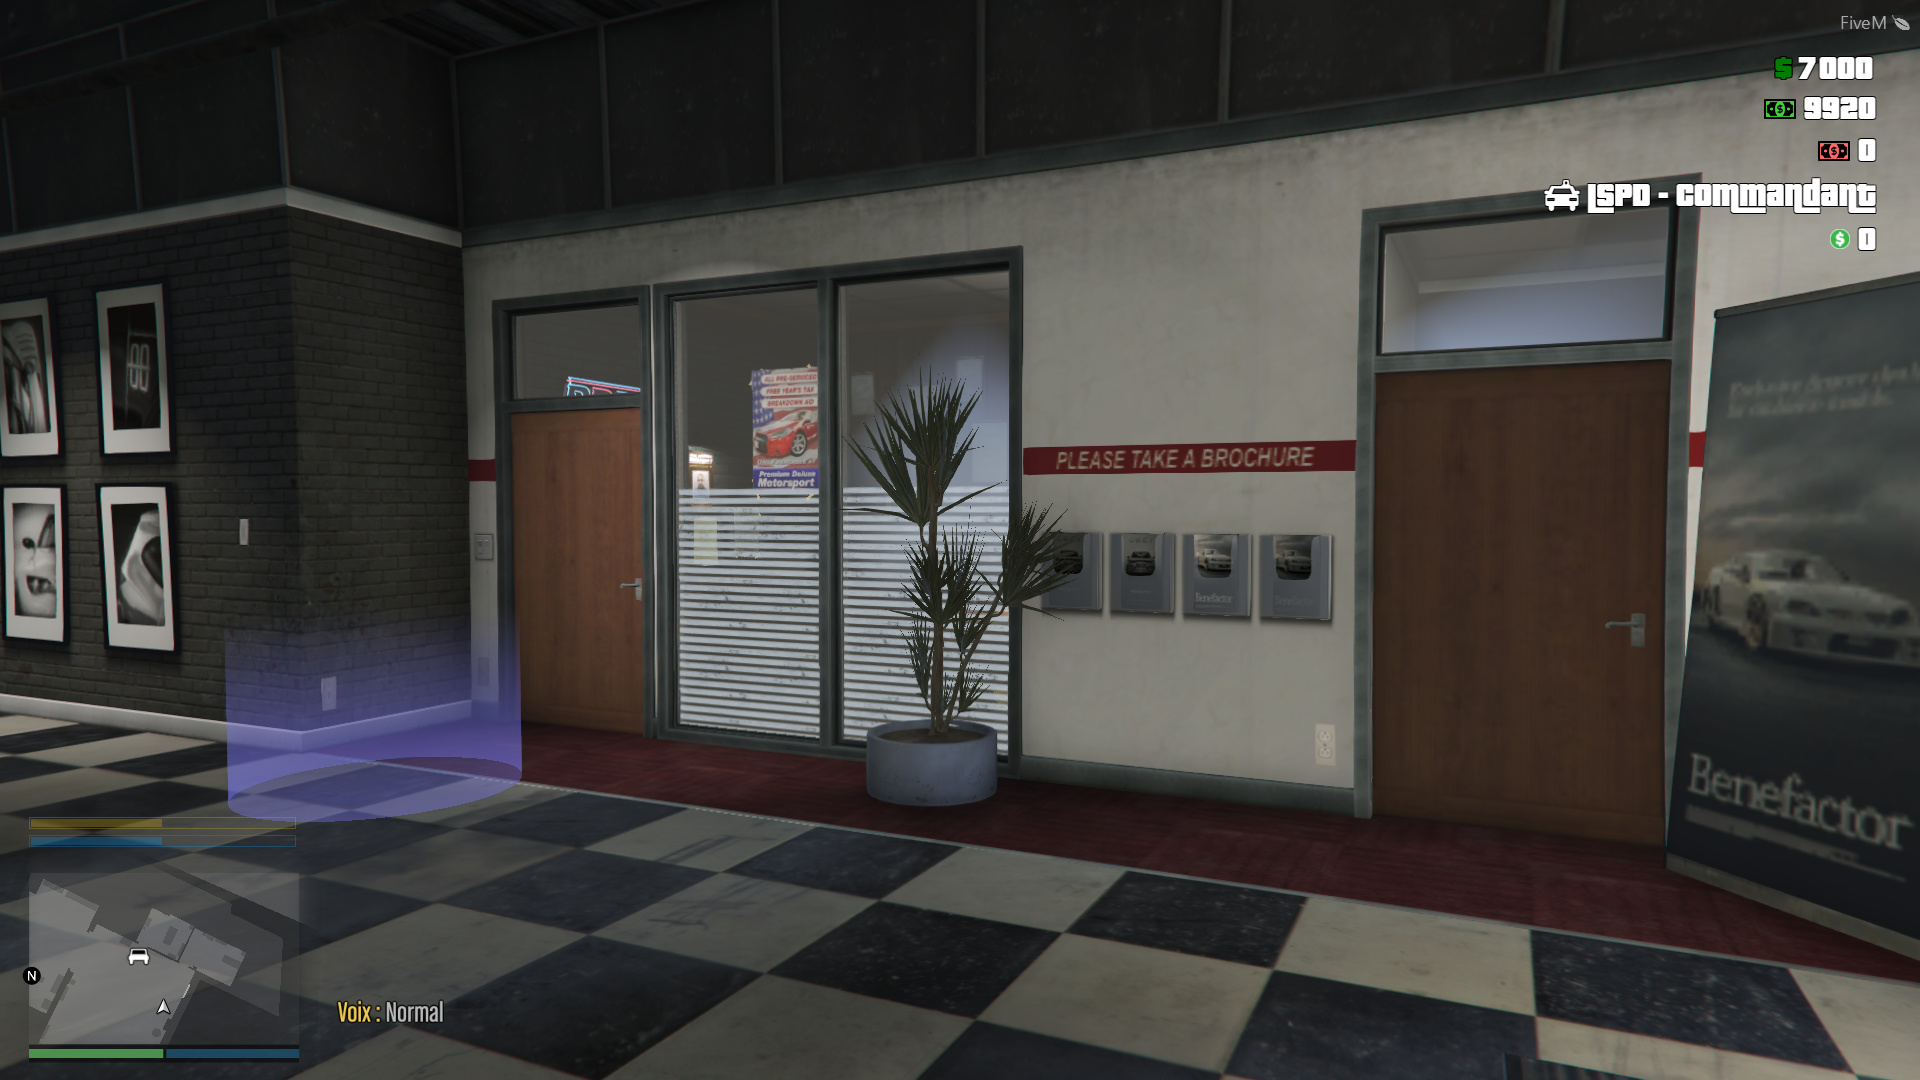 Help Automobile Dealer Garage Doors Discussion Fivem